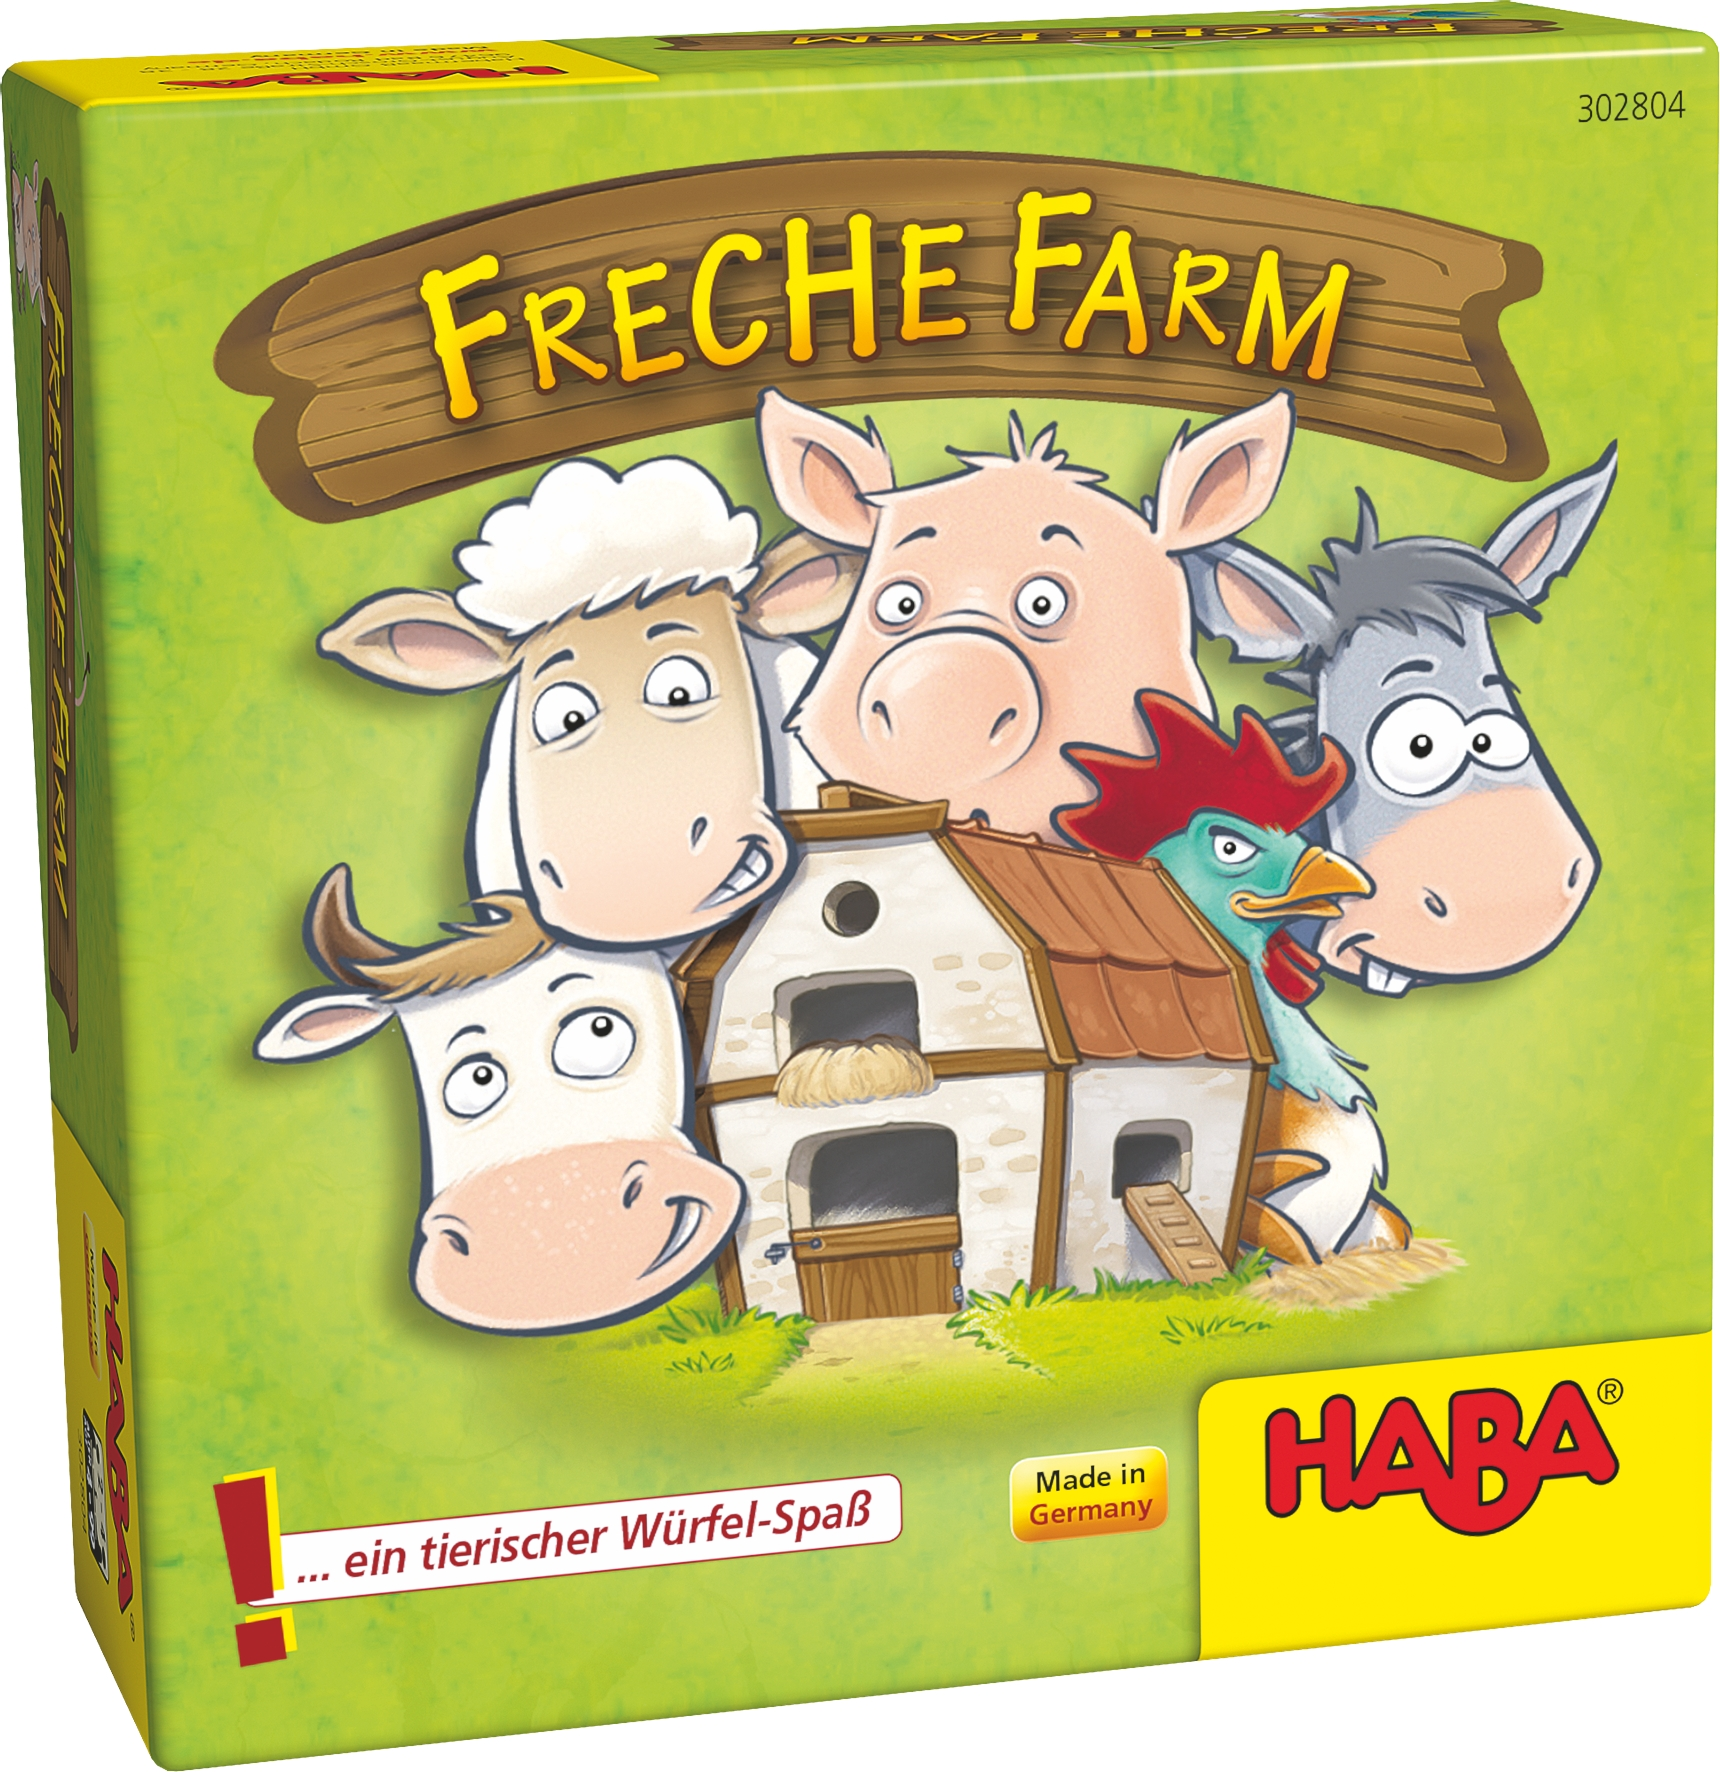 Alle Farm Spiele